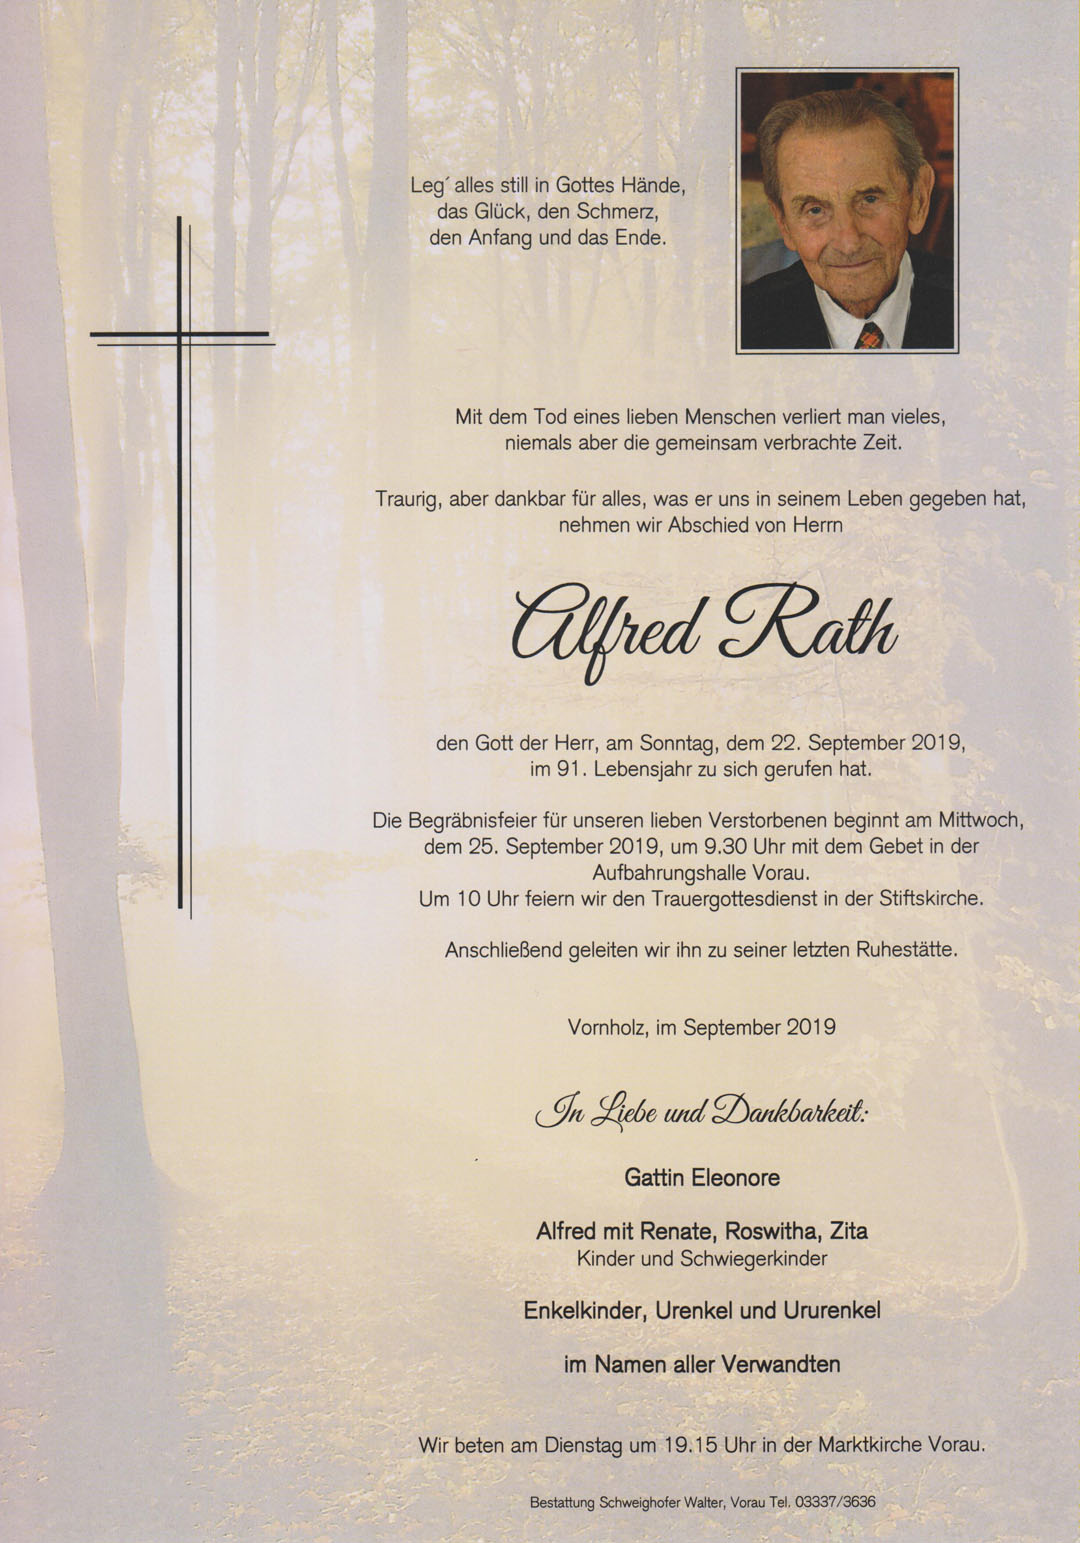 Alfred Rath